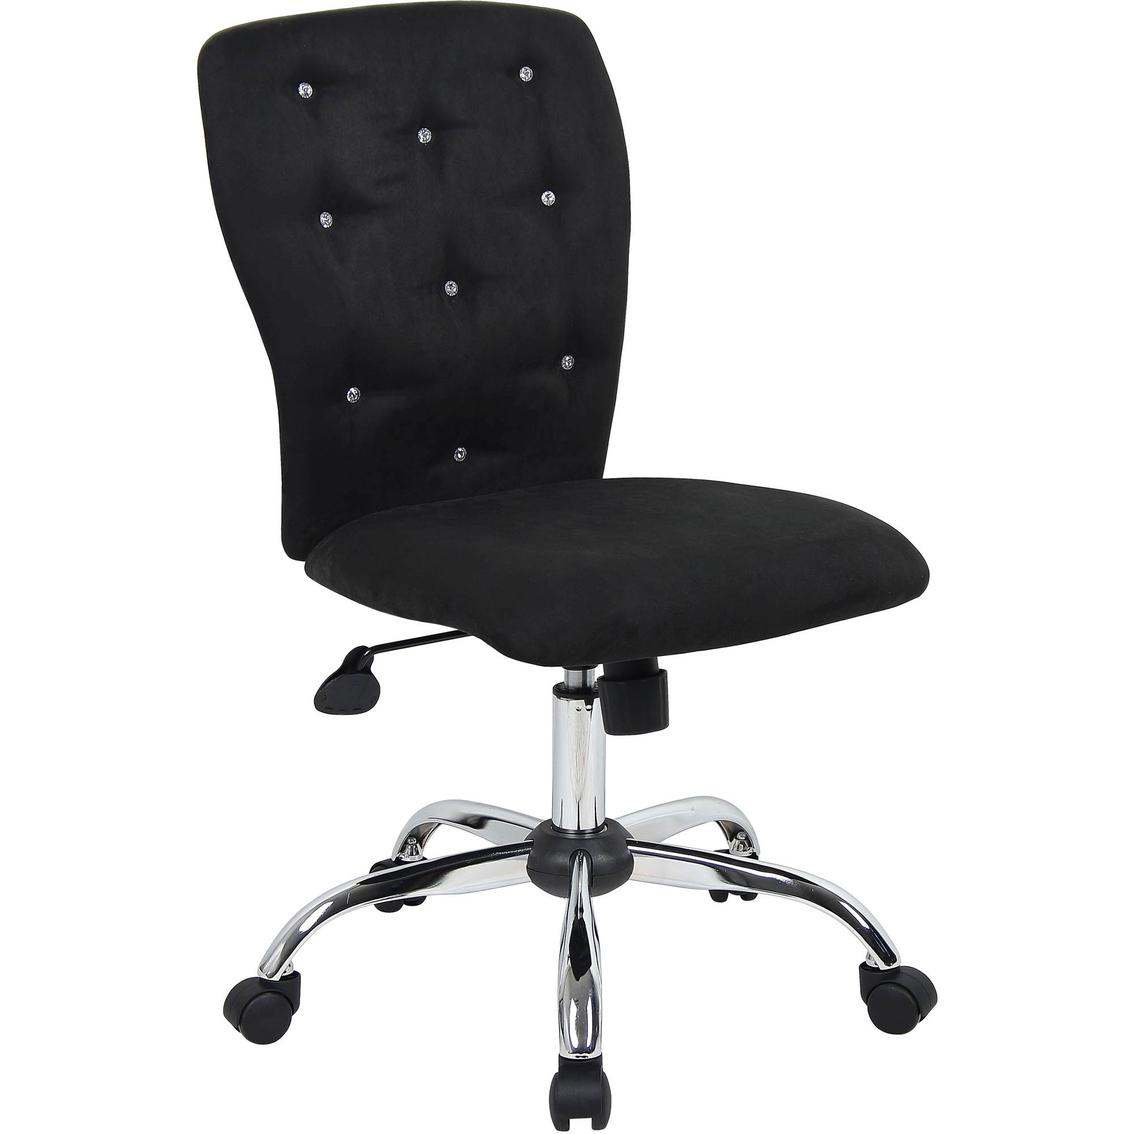 Presidential Seating Black Microfiber Chair  sc 1 st  ShopMyExchange.com & Presidential Seating Black Microfiber Chair   Office Chairs   More ...